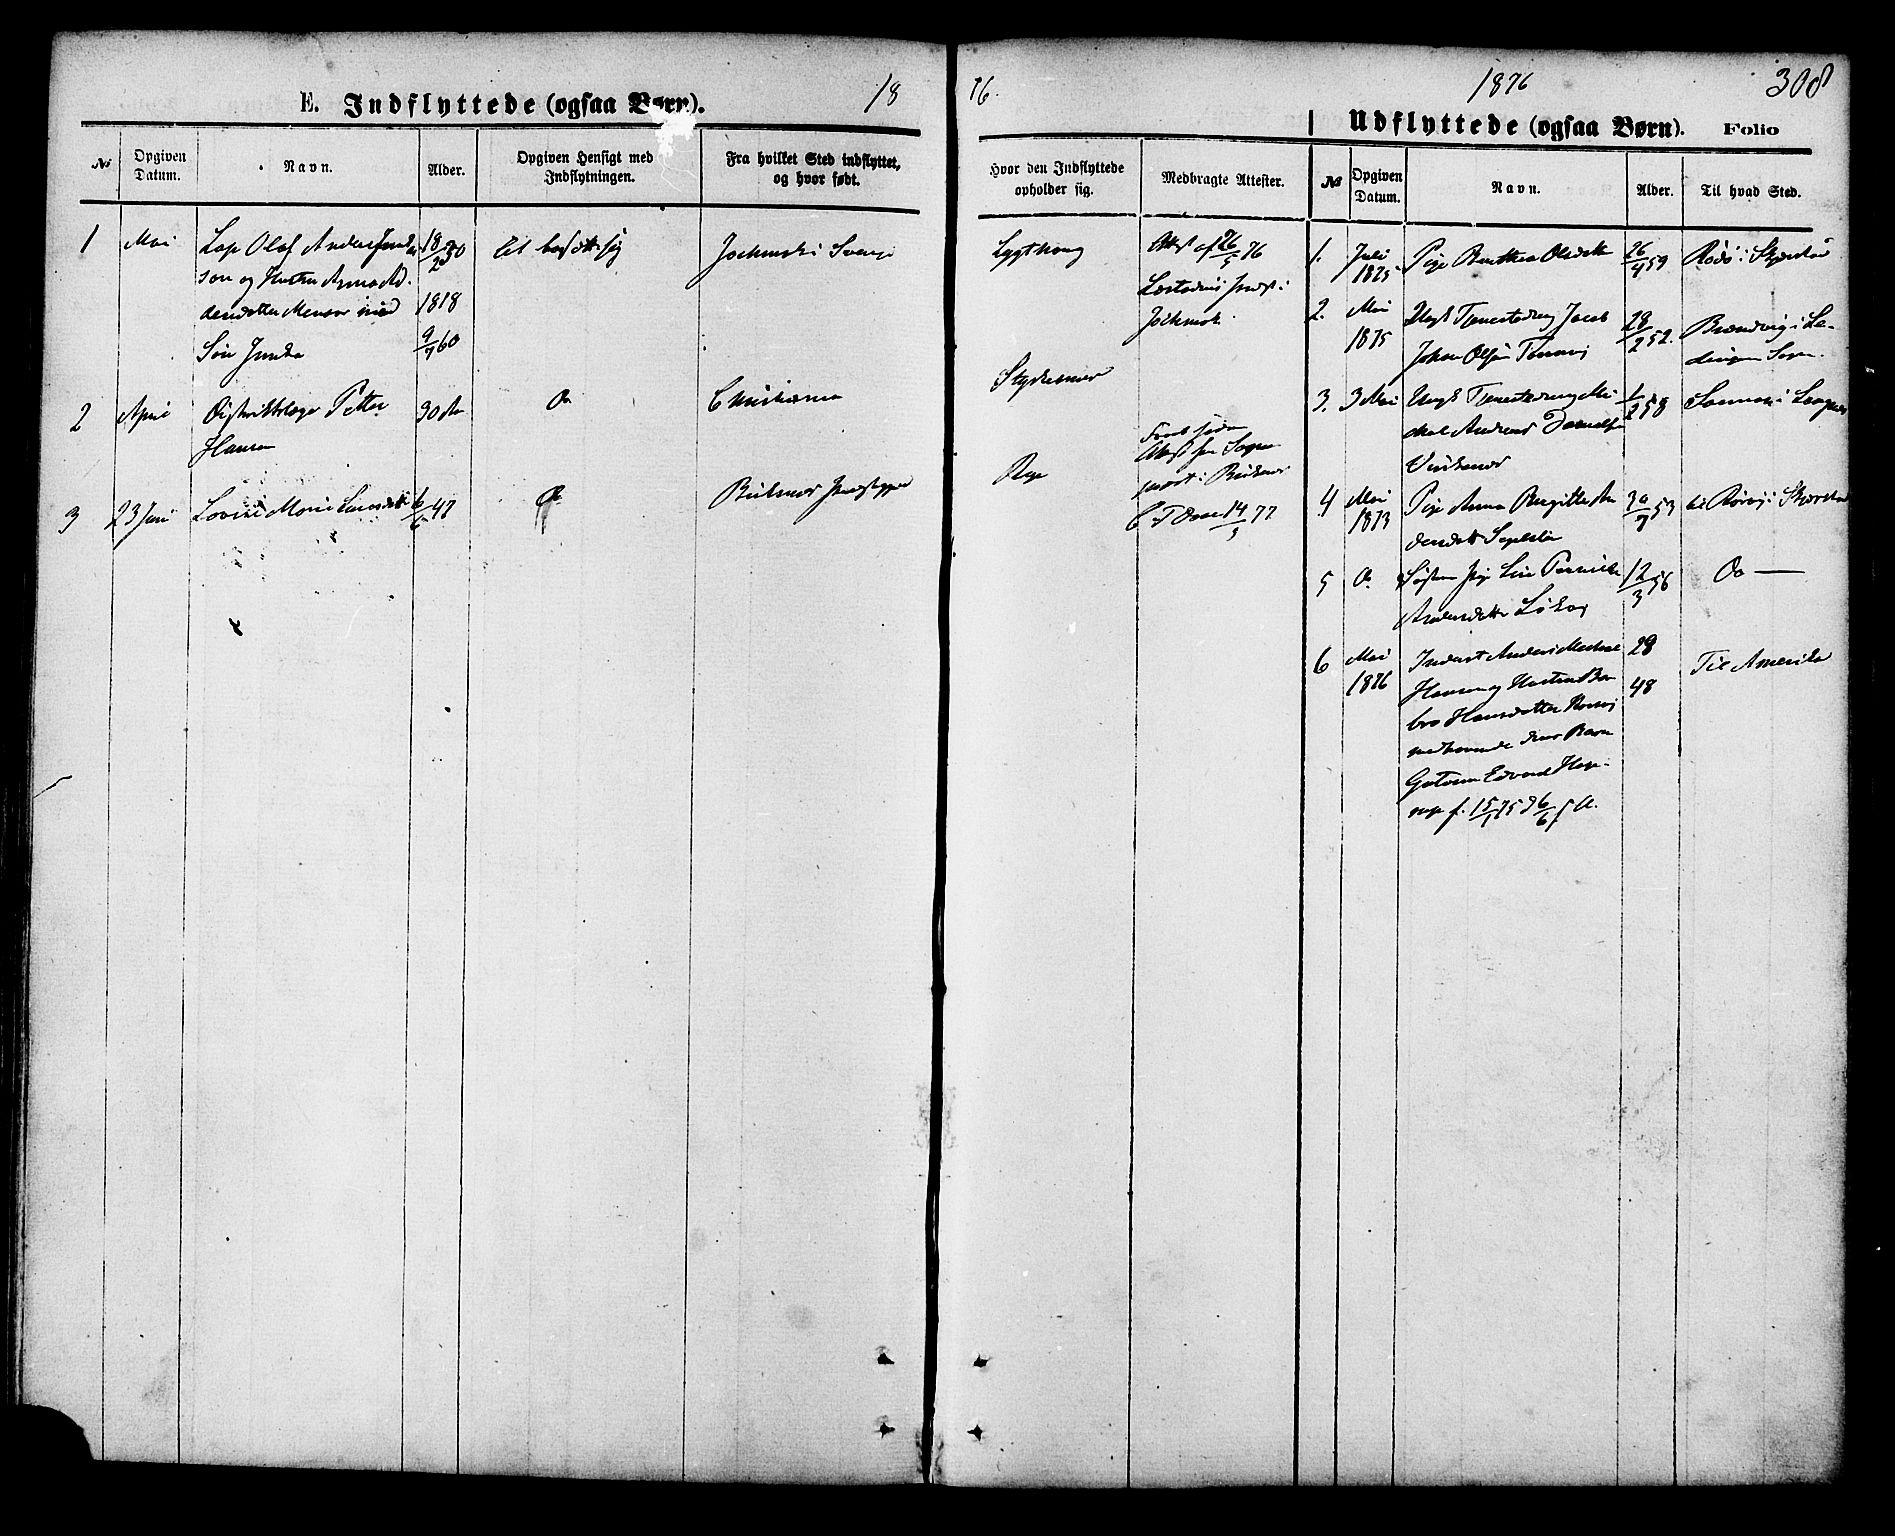 SAT, Ministerialprotokoller, klokkerbøker og fødselsregistre - Nordland, 853/L0771: Ministerialbok nr. 853A10, 1870-1881, s. 308